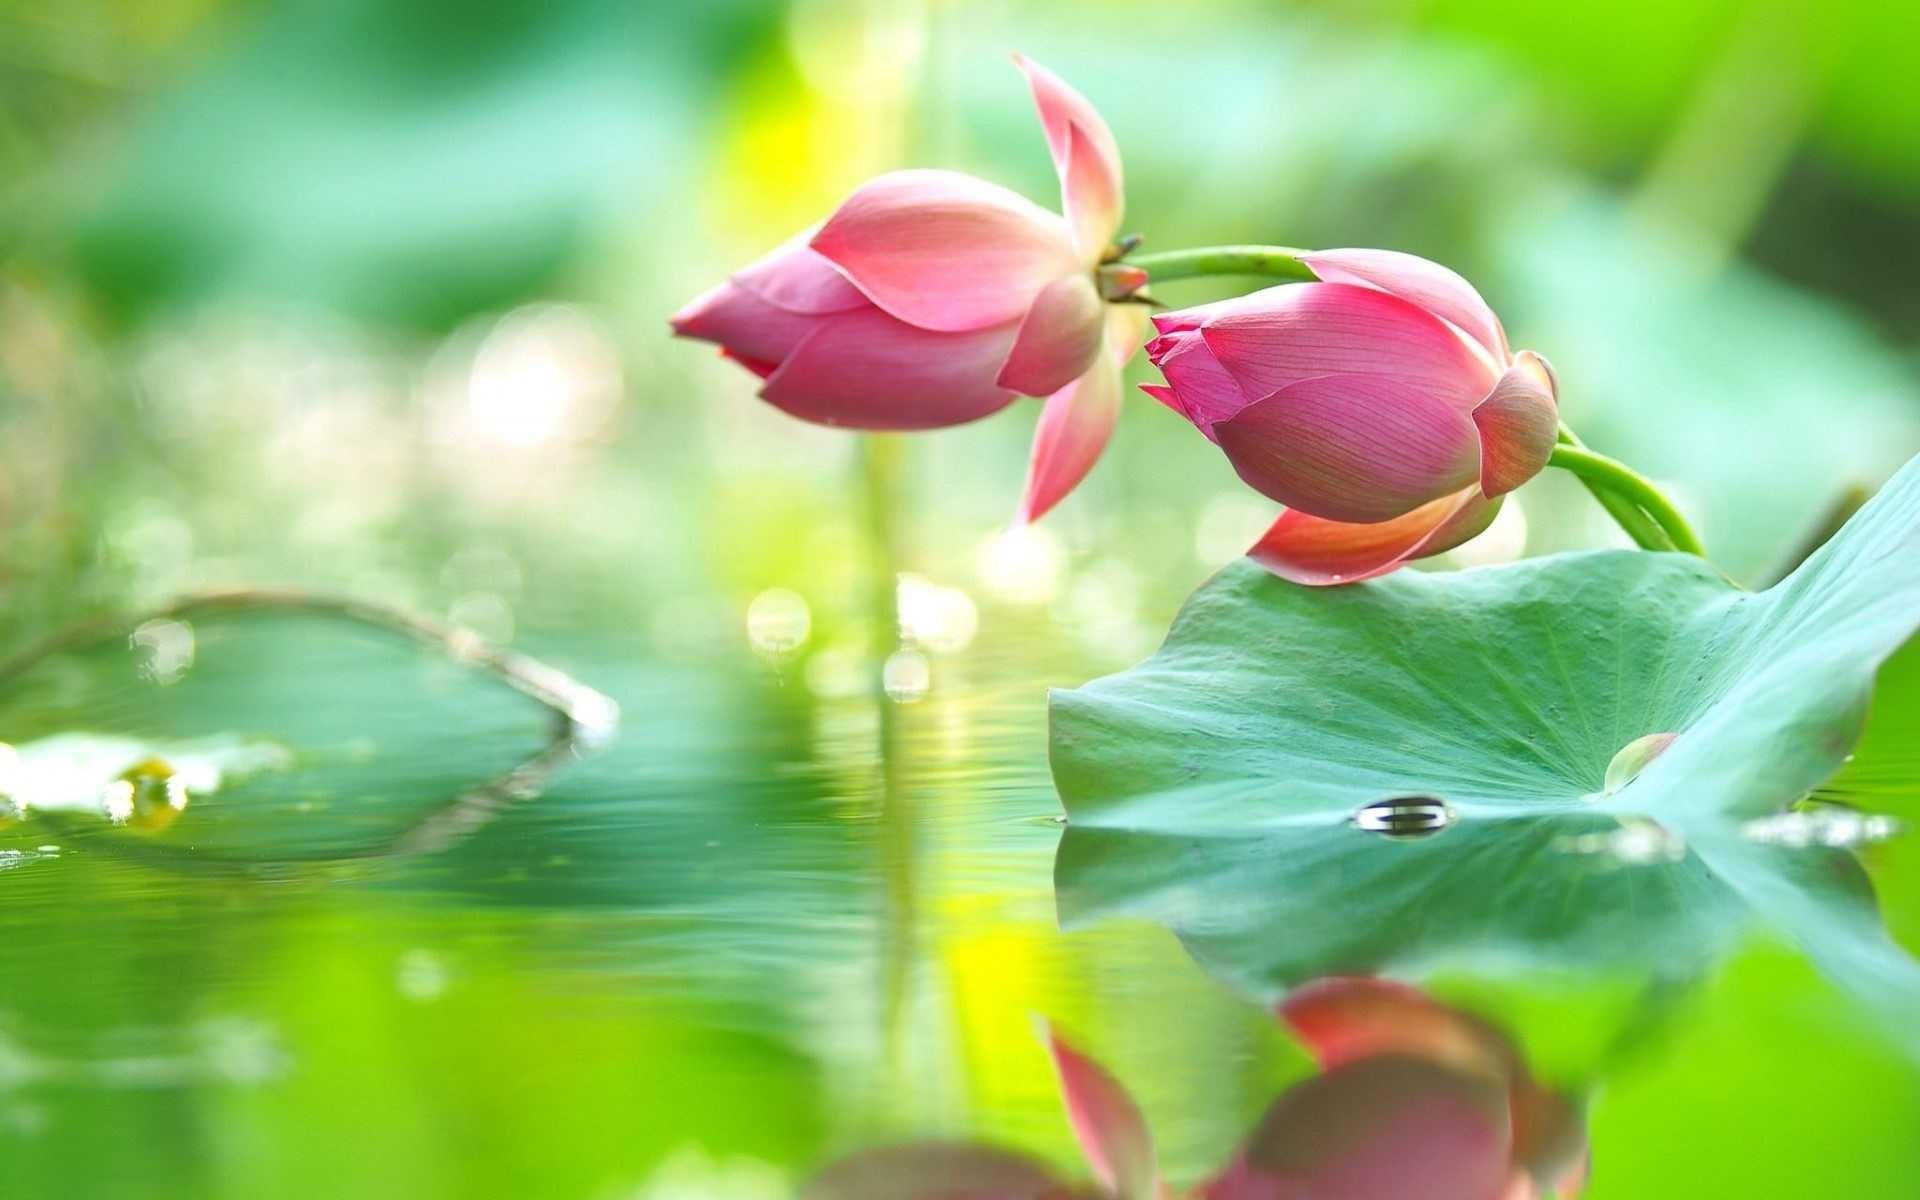 Pink Lotus Flower With Water Drop Iphone Hd Wallpapers - Hoa Sen , HD Wallpaper & Backgrounds